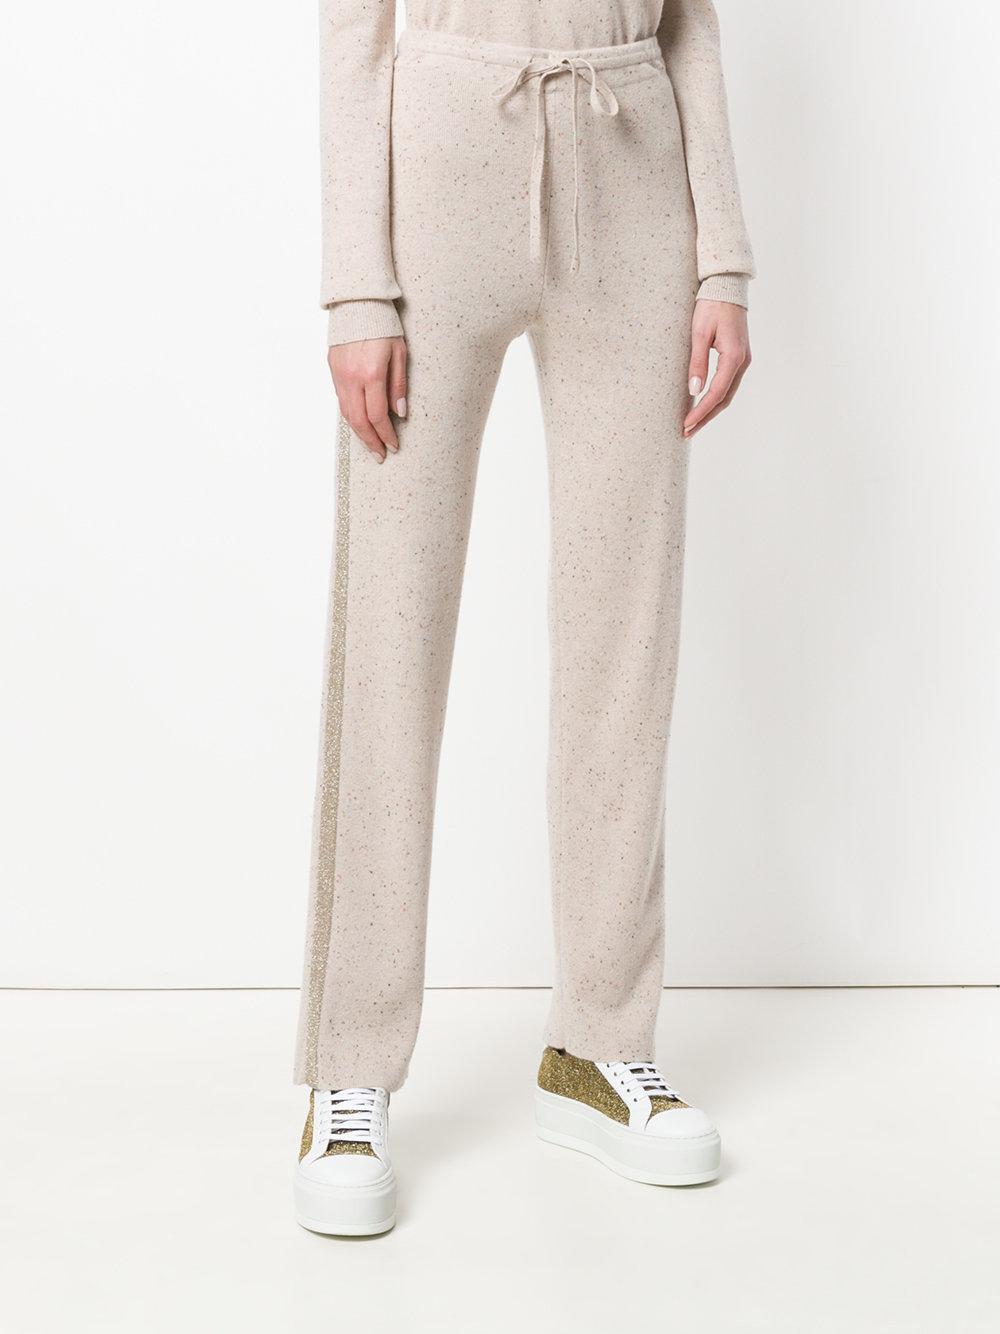 side stripe track pants - Nude & Neutrals Sonia Rykiel Recommend 5M9Z4BW